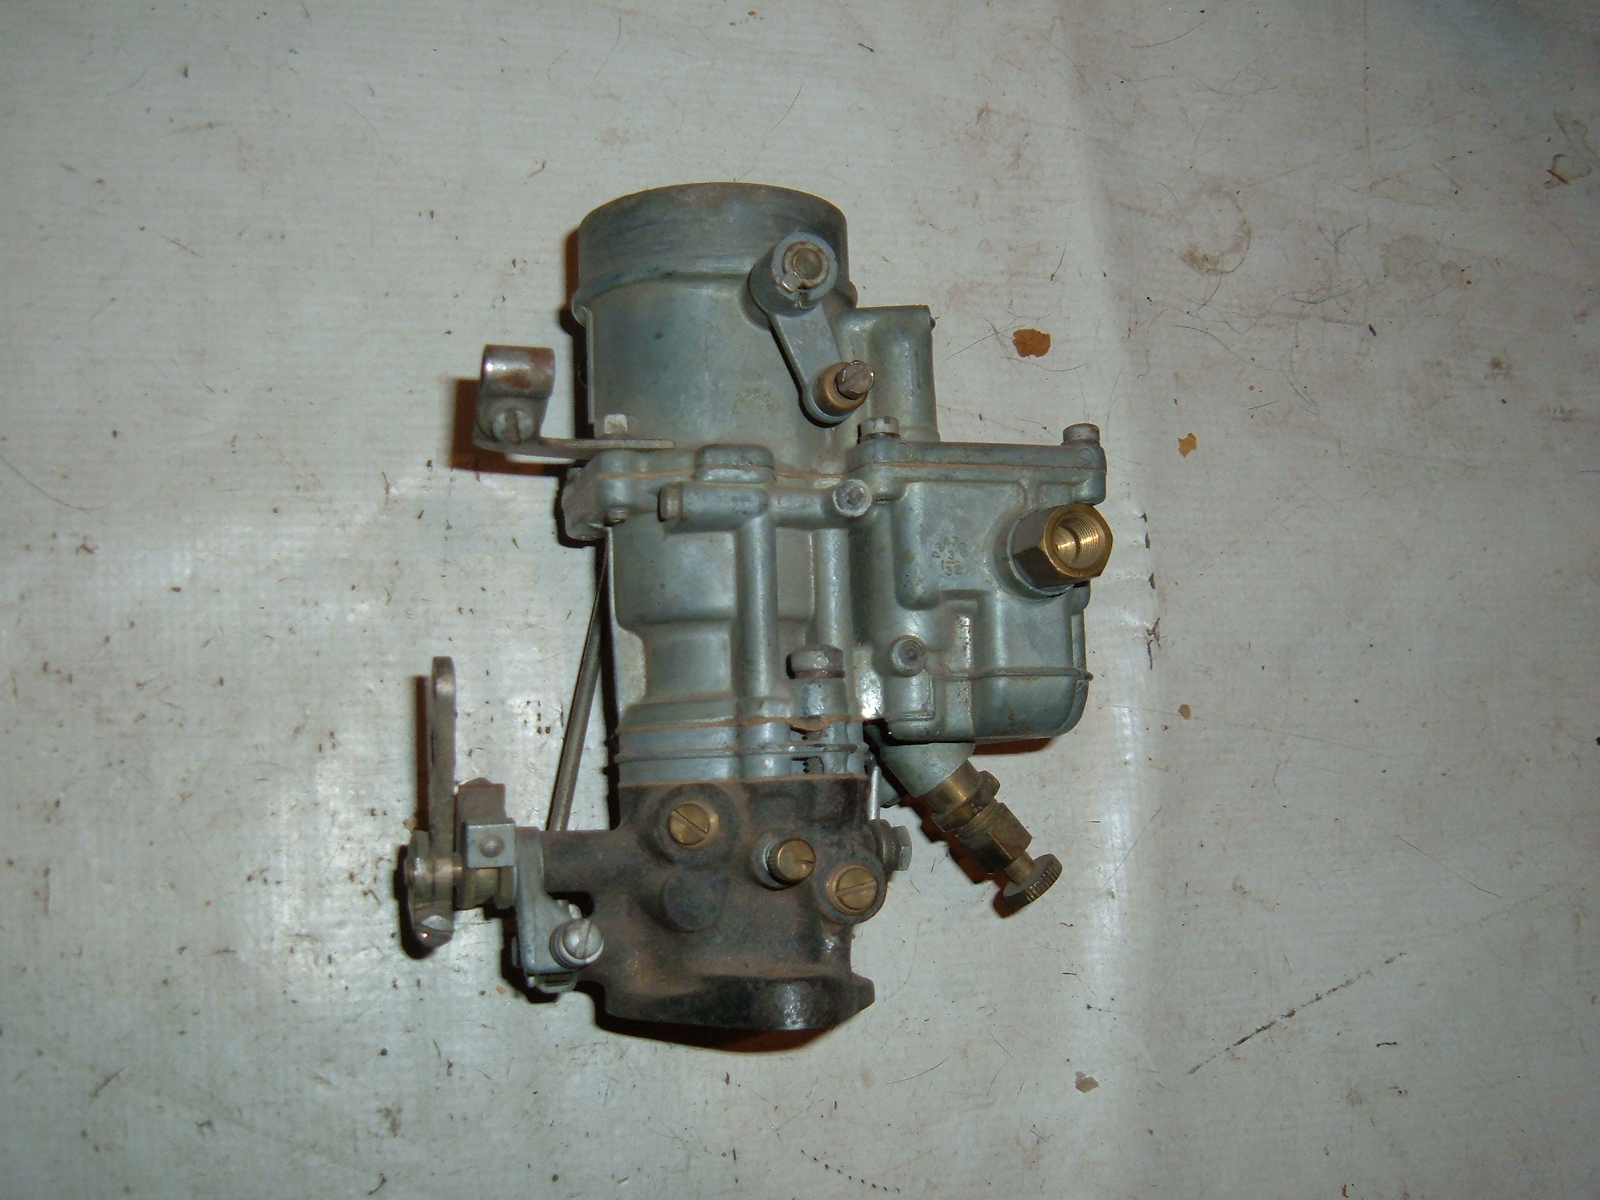 1939 dodge truck stromberg revuilt carburetor 1-93A (z 1-93a)